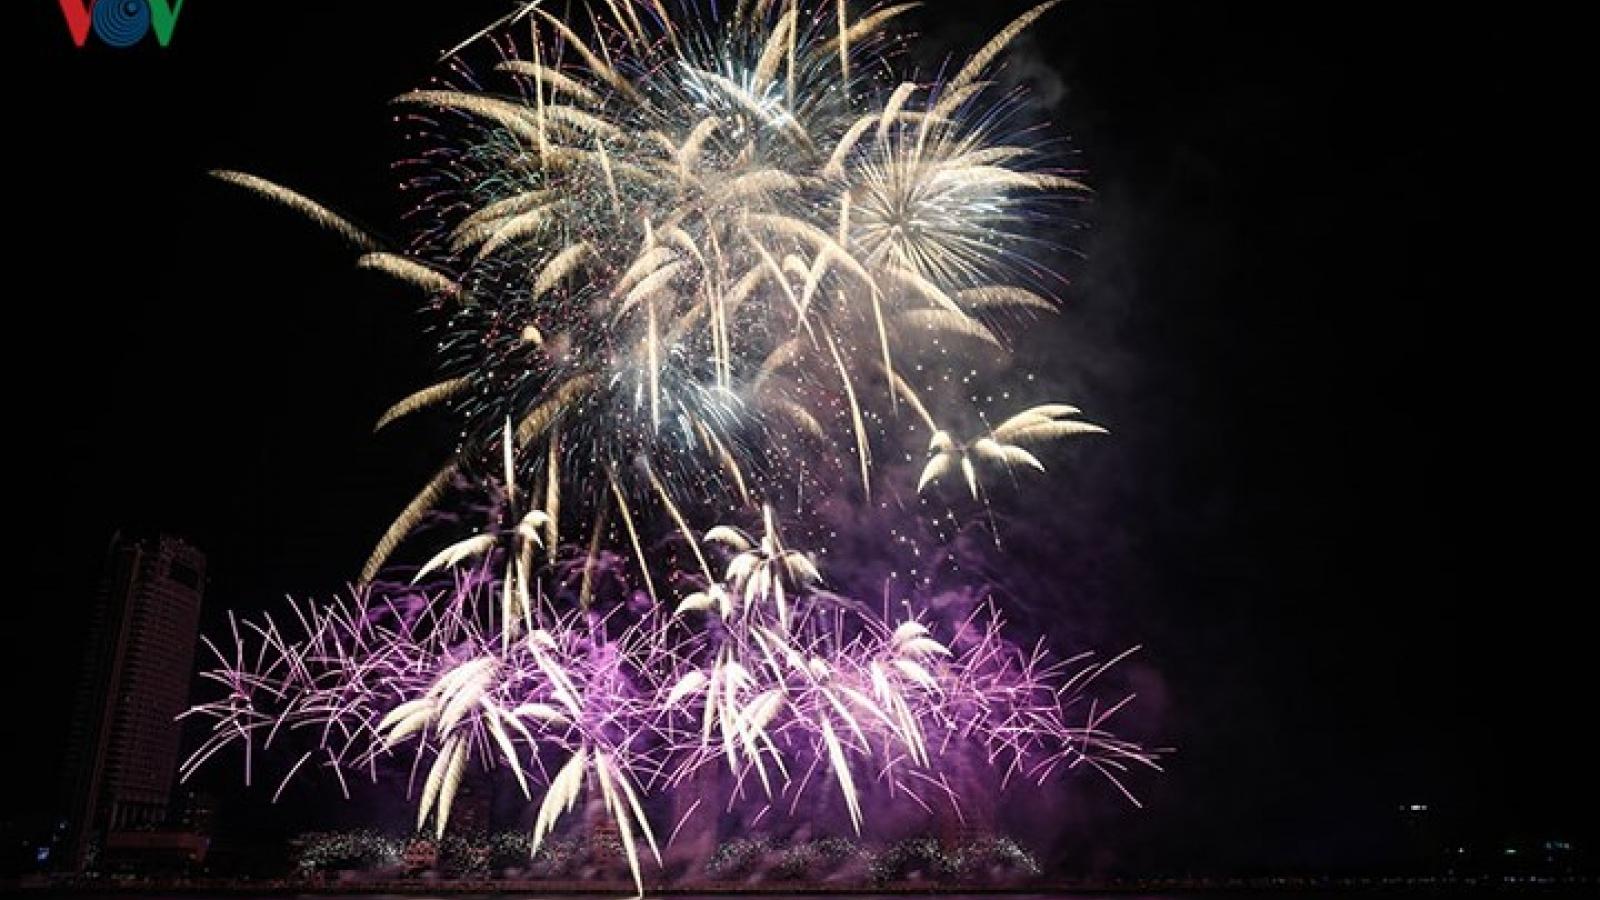 Fireworks festival set to light up Danang skies for 2 months